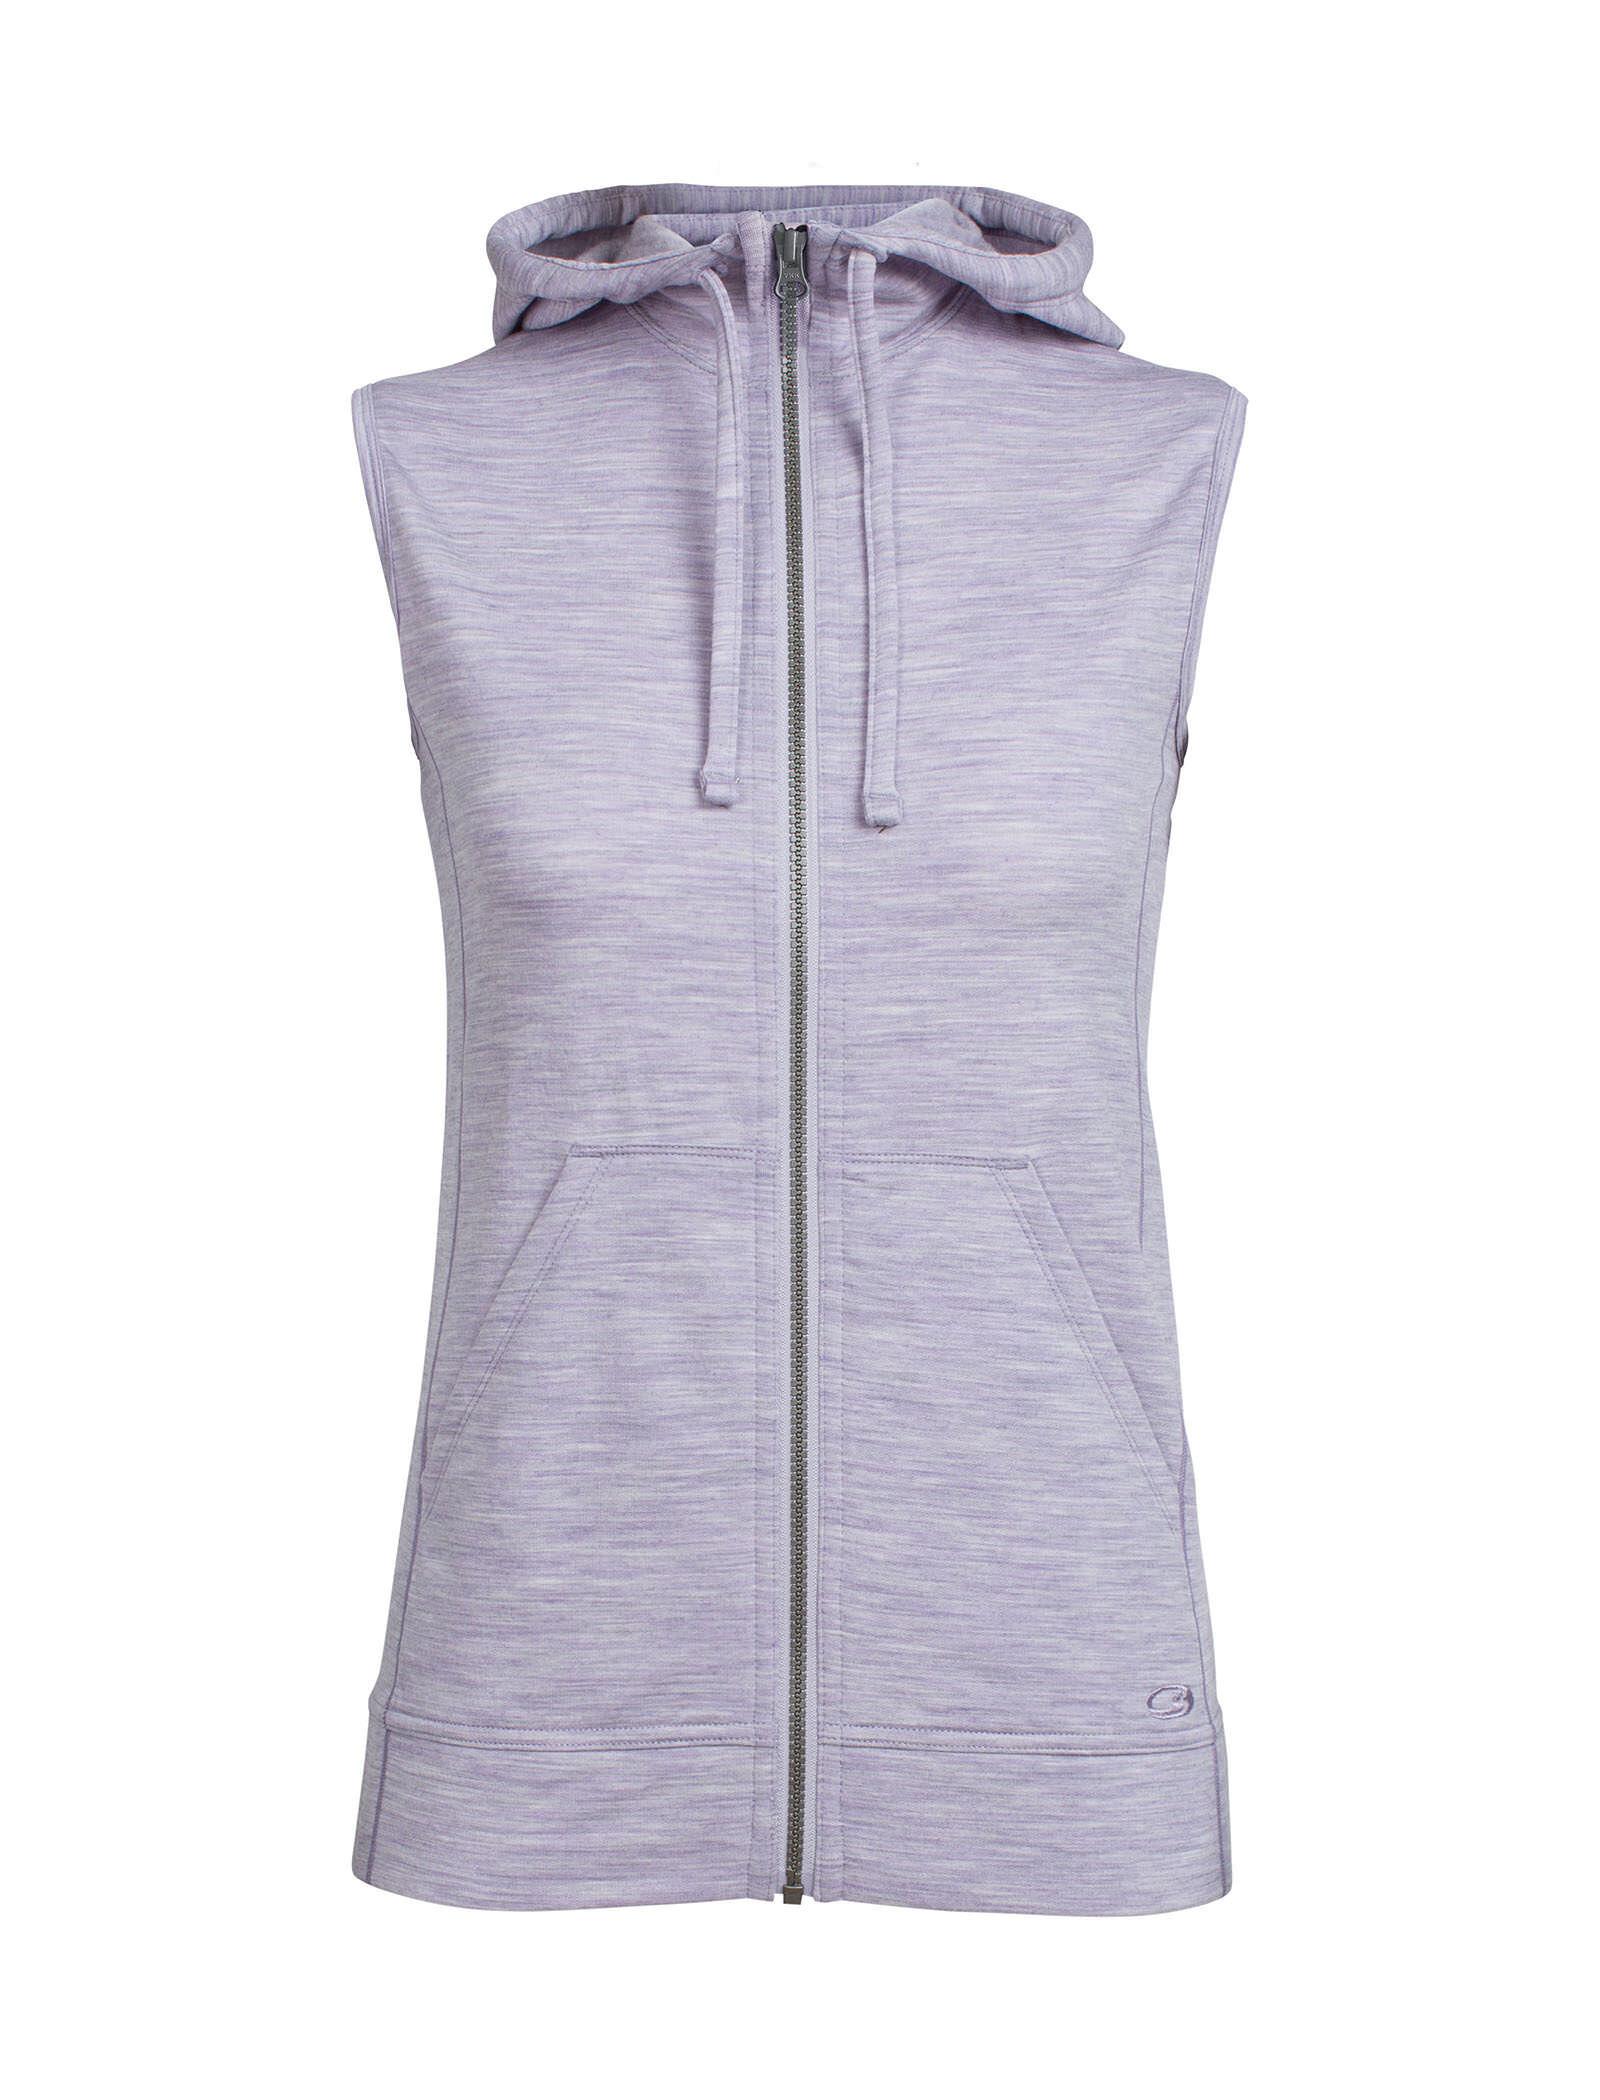 Icebreaker Womens Dia Mid Layers Vest